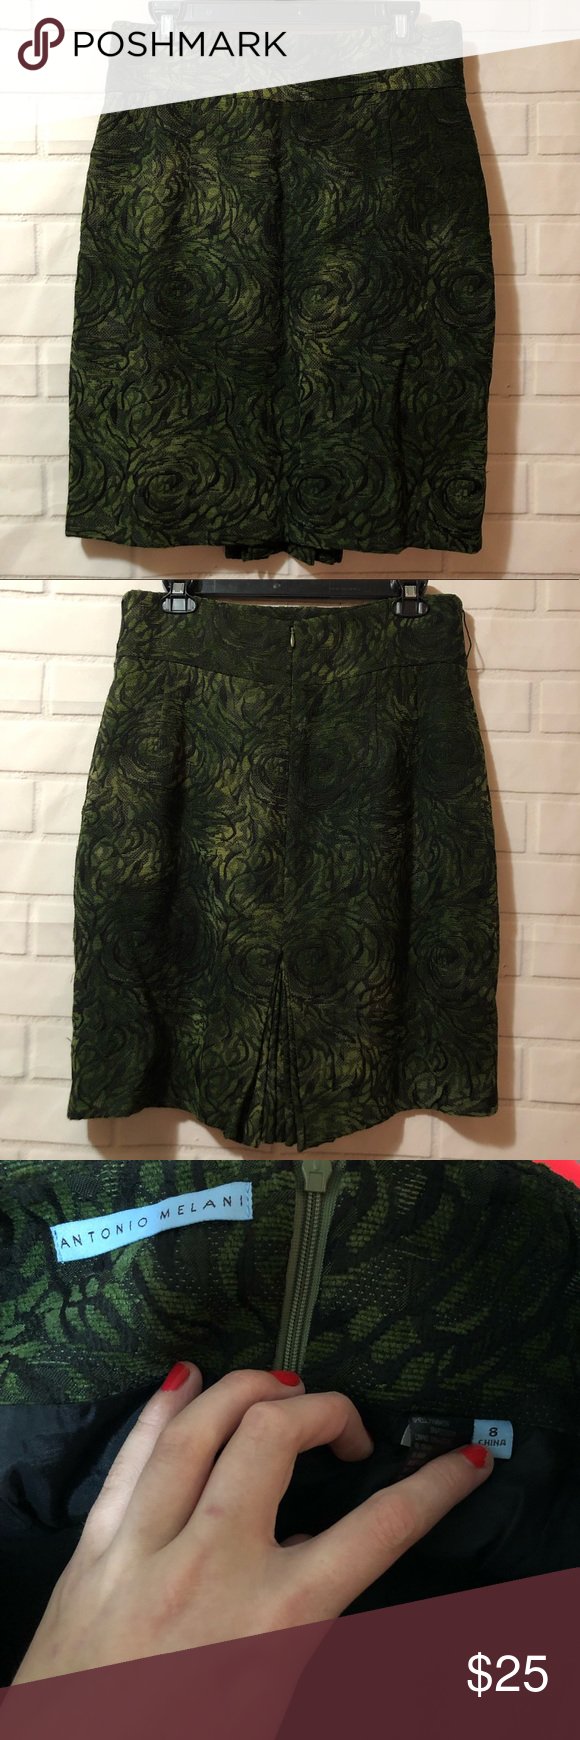 c4d00d6984 Antonio Melani Dark Green Rosette Floral Skirt Antonio Melani Dark Green  Rosette Floral Pleated Back Professional Career Midi Skirt, excellent  condition!